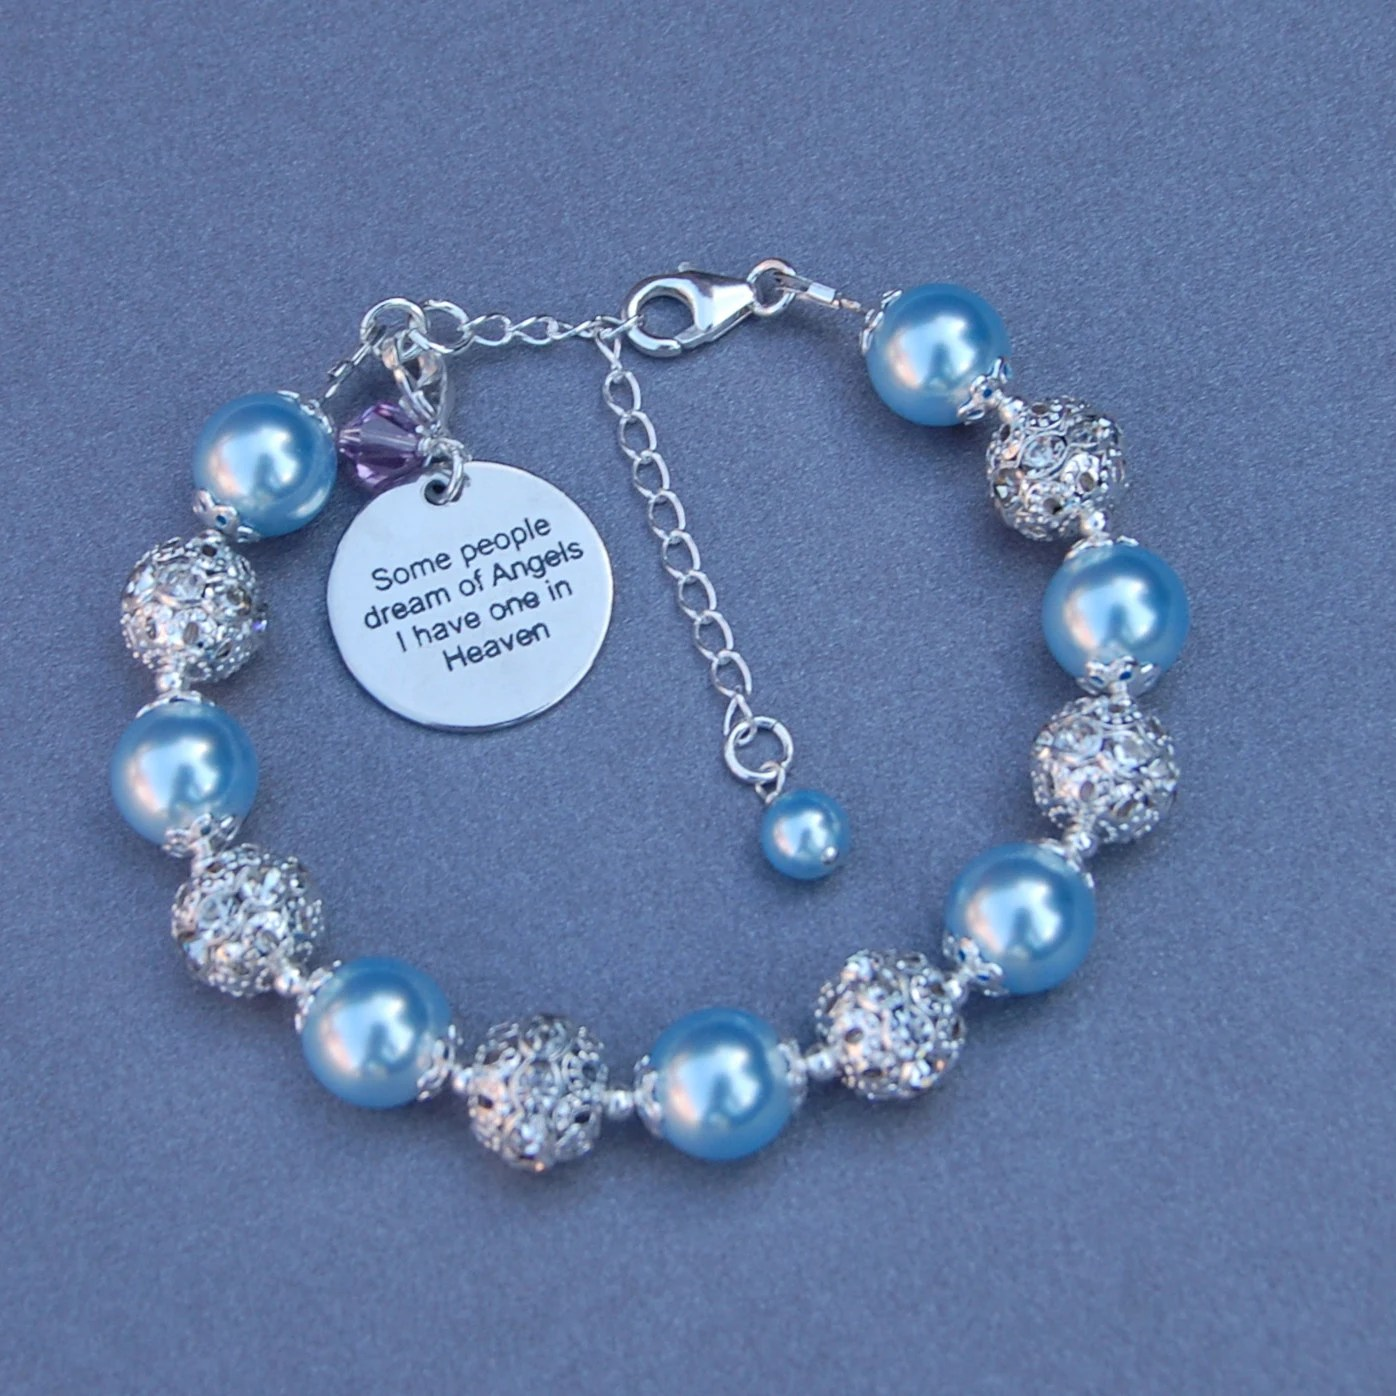 Someone In Heaven Gift In Memory Jewelry Memorial Bracelet